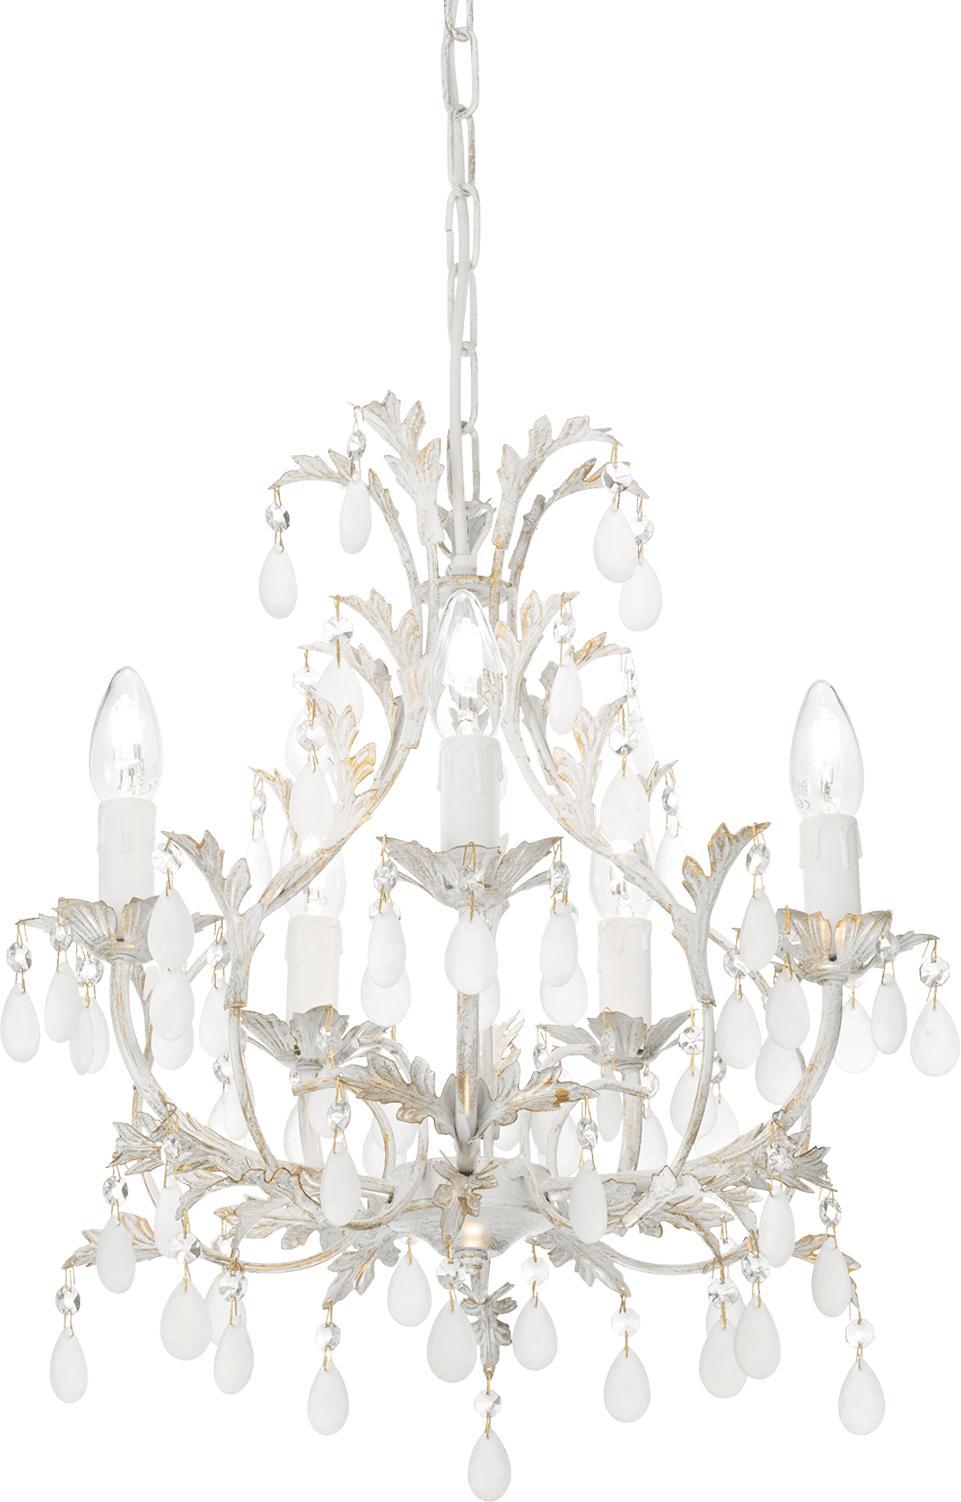 Ideal lux LED Cascina Kronleuchter 5x5W 100272